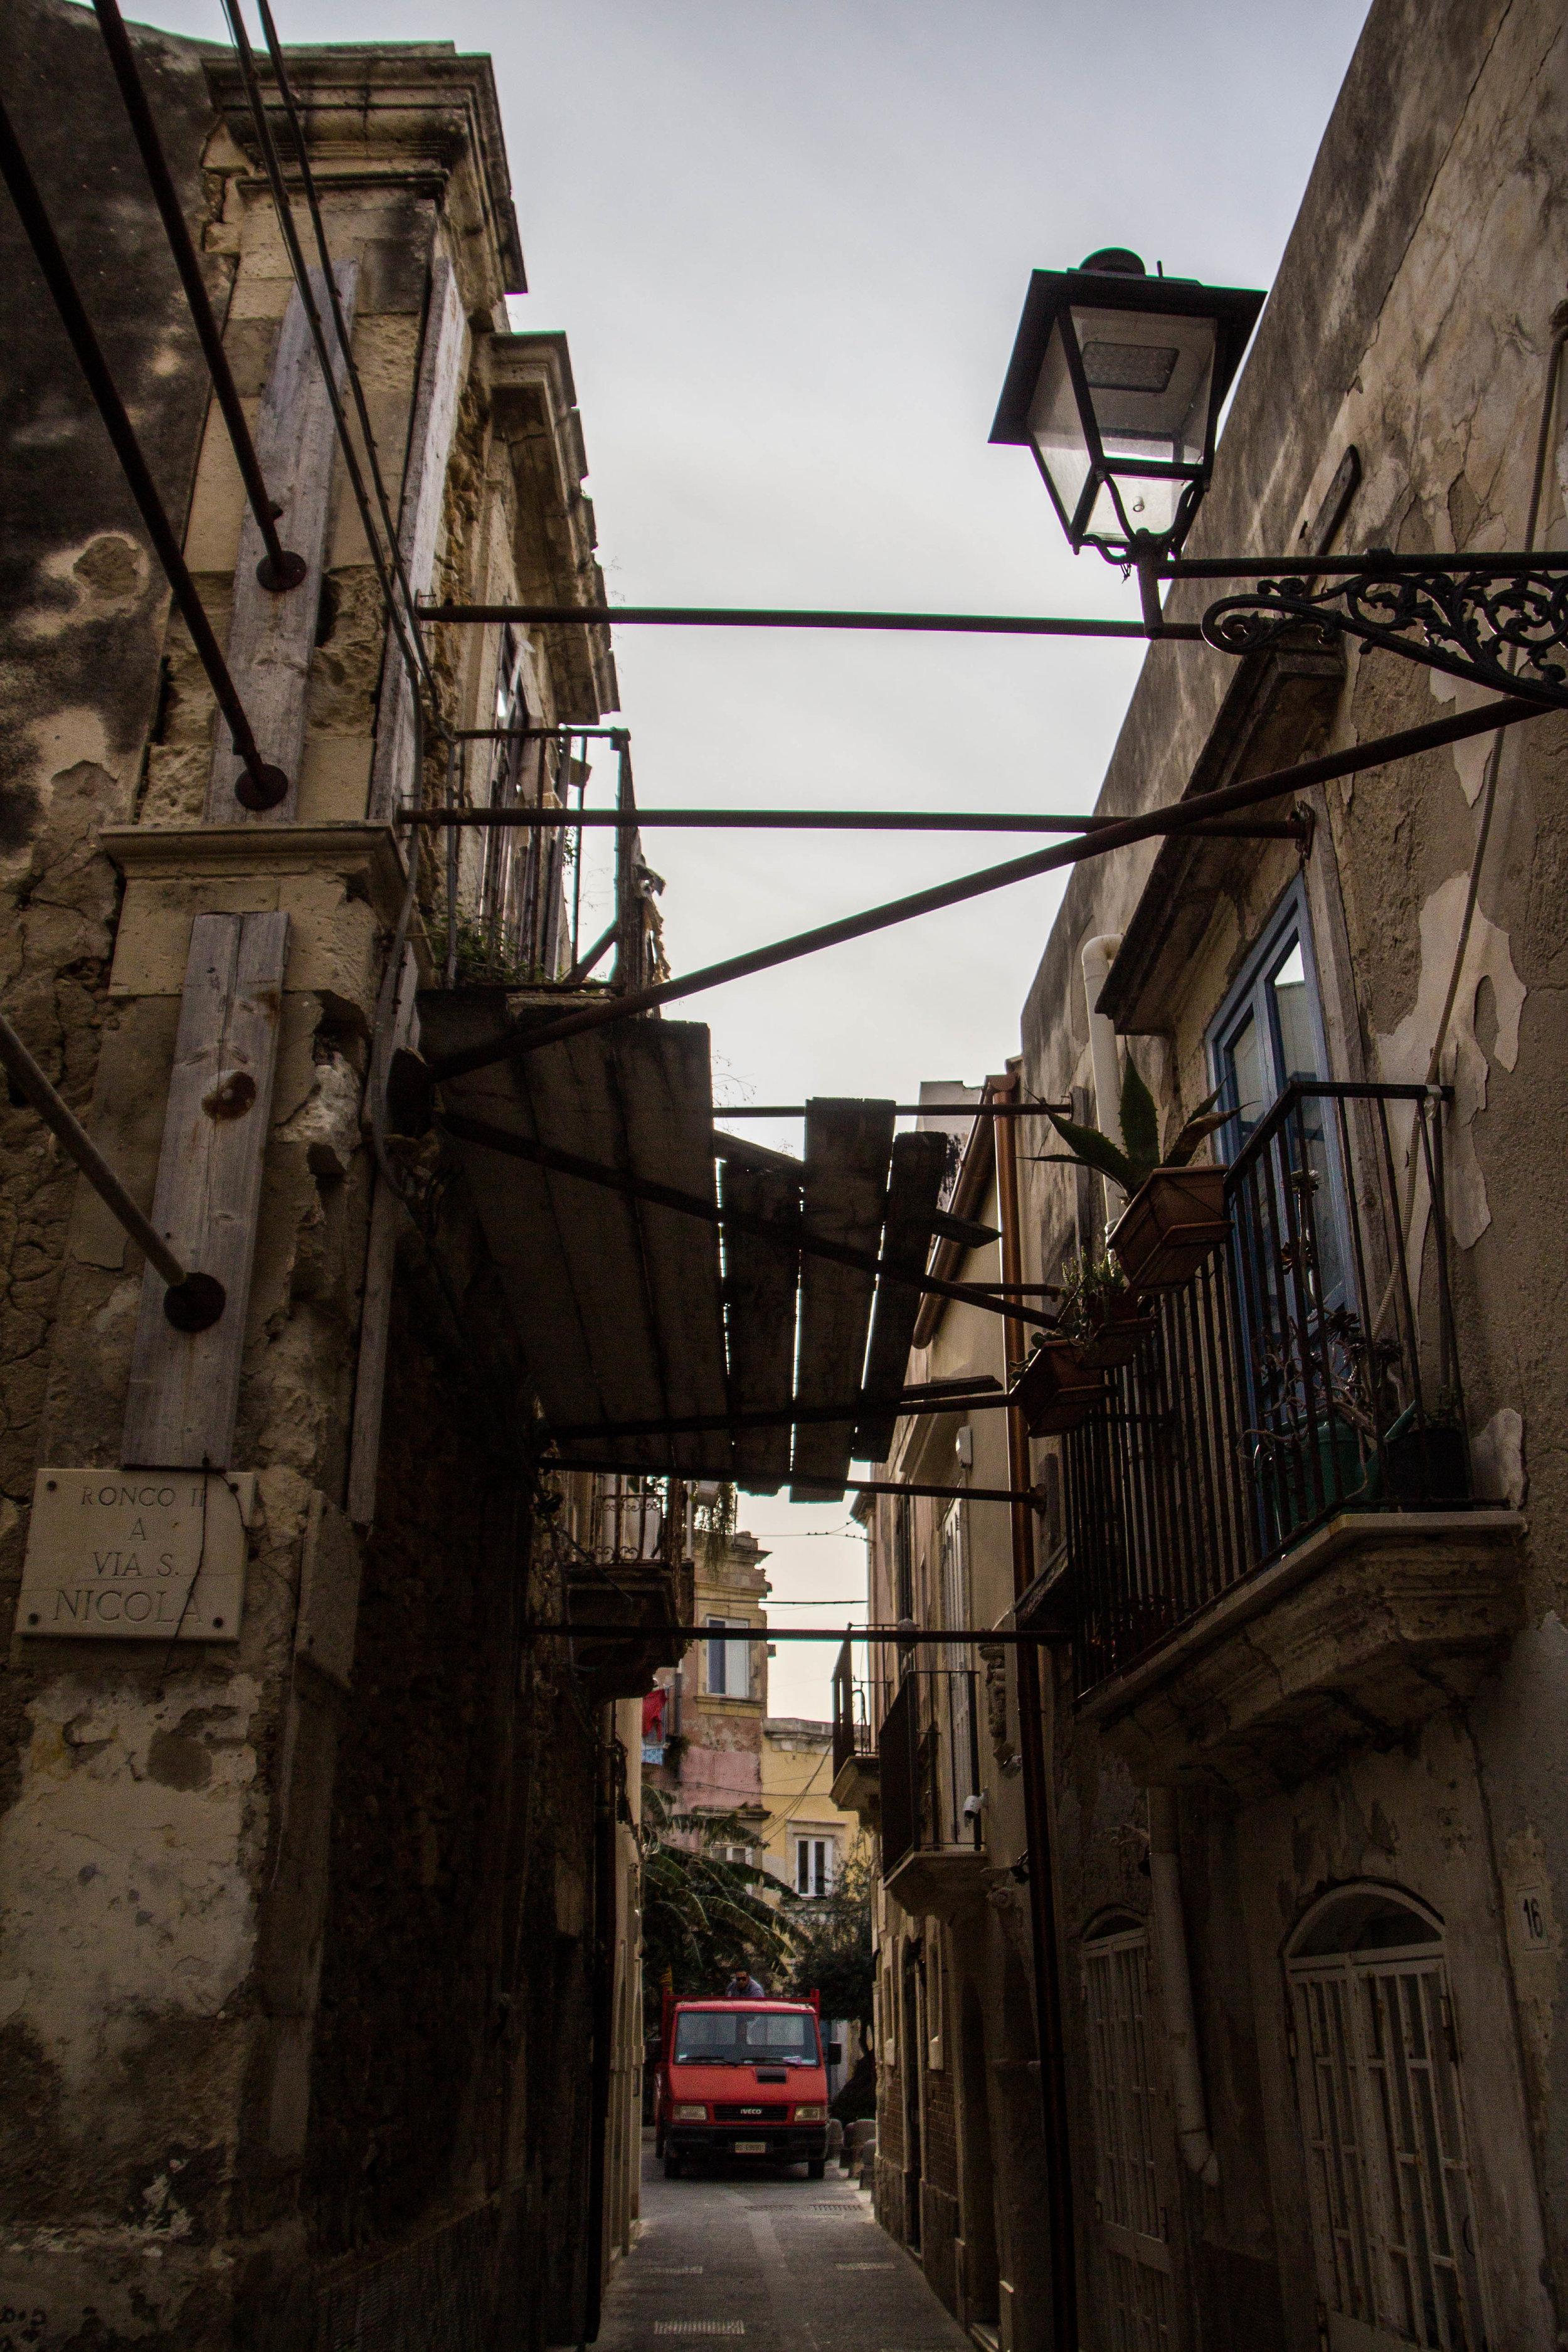 streets-ortygia-syracuse-sicily-60.jpg